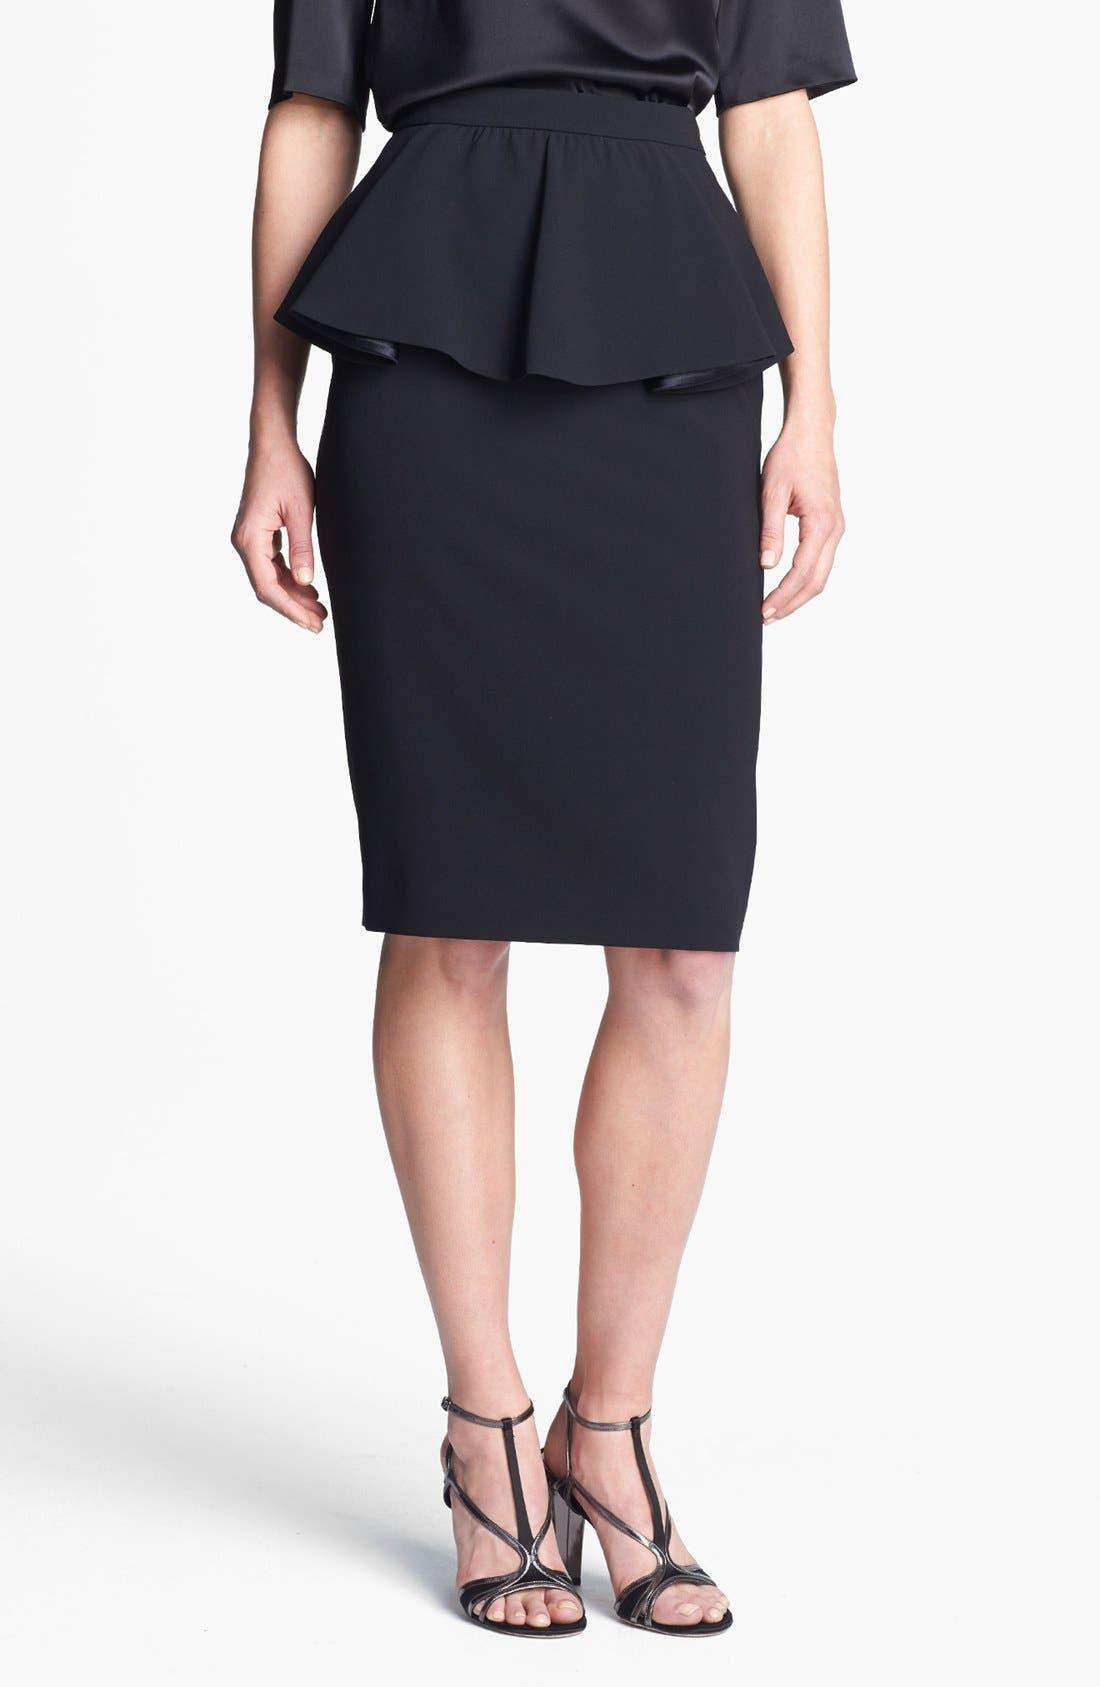 ST. JOHN COLLECTION, Draped Peplum Crepe Marocain Skirt, Main thumbnail 1, color, 001